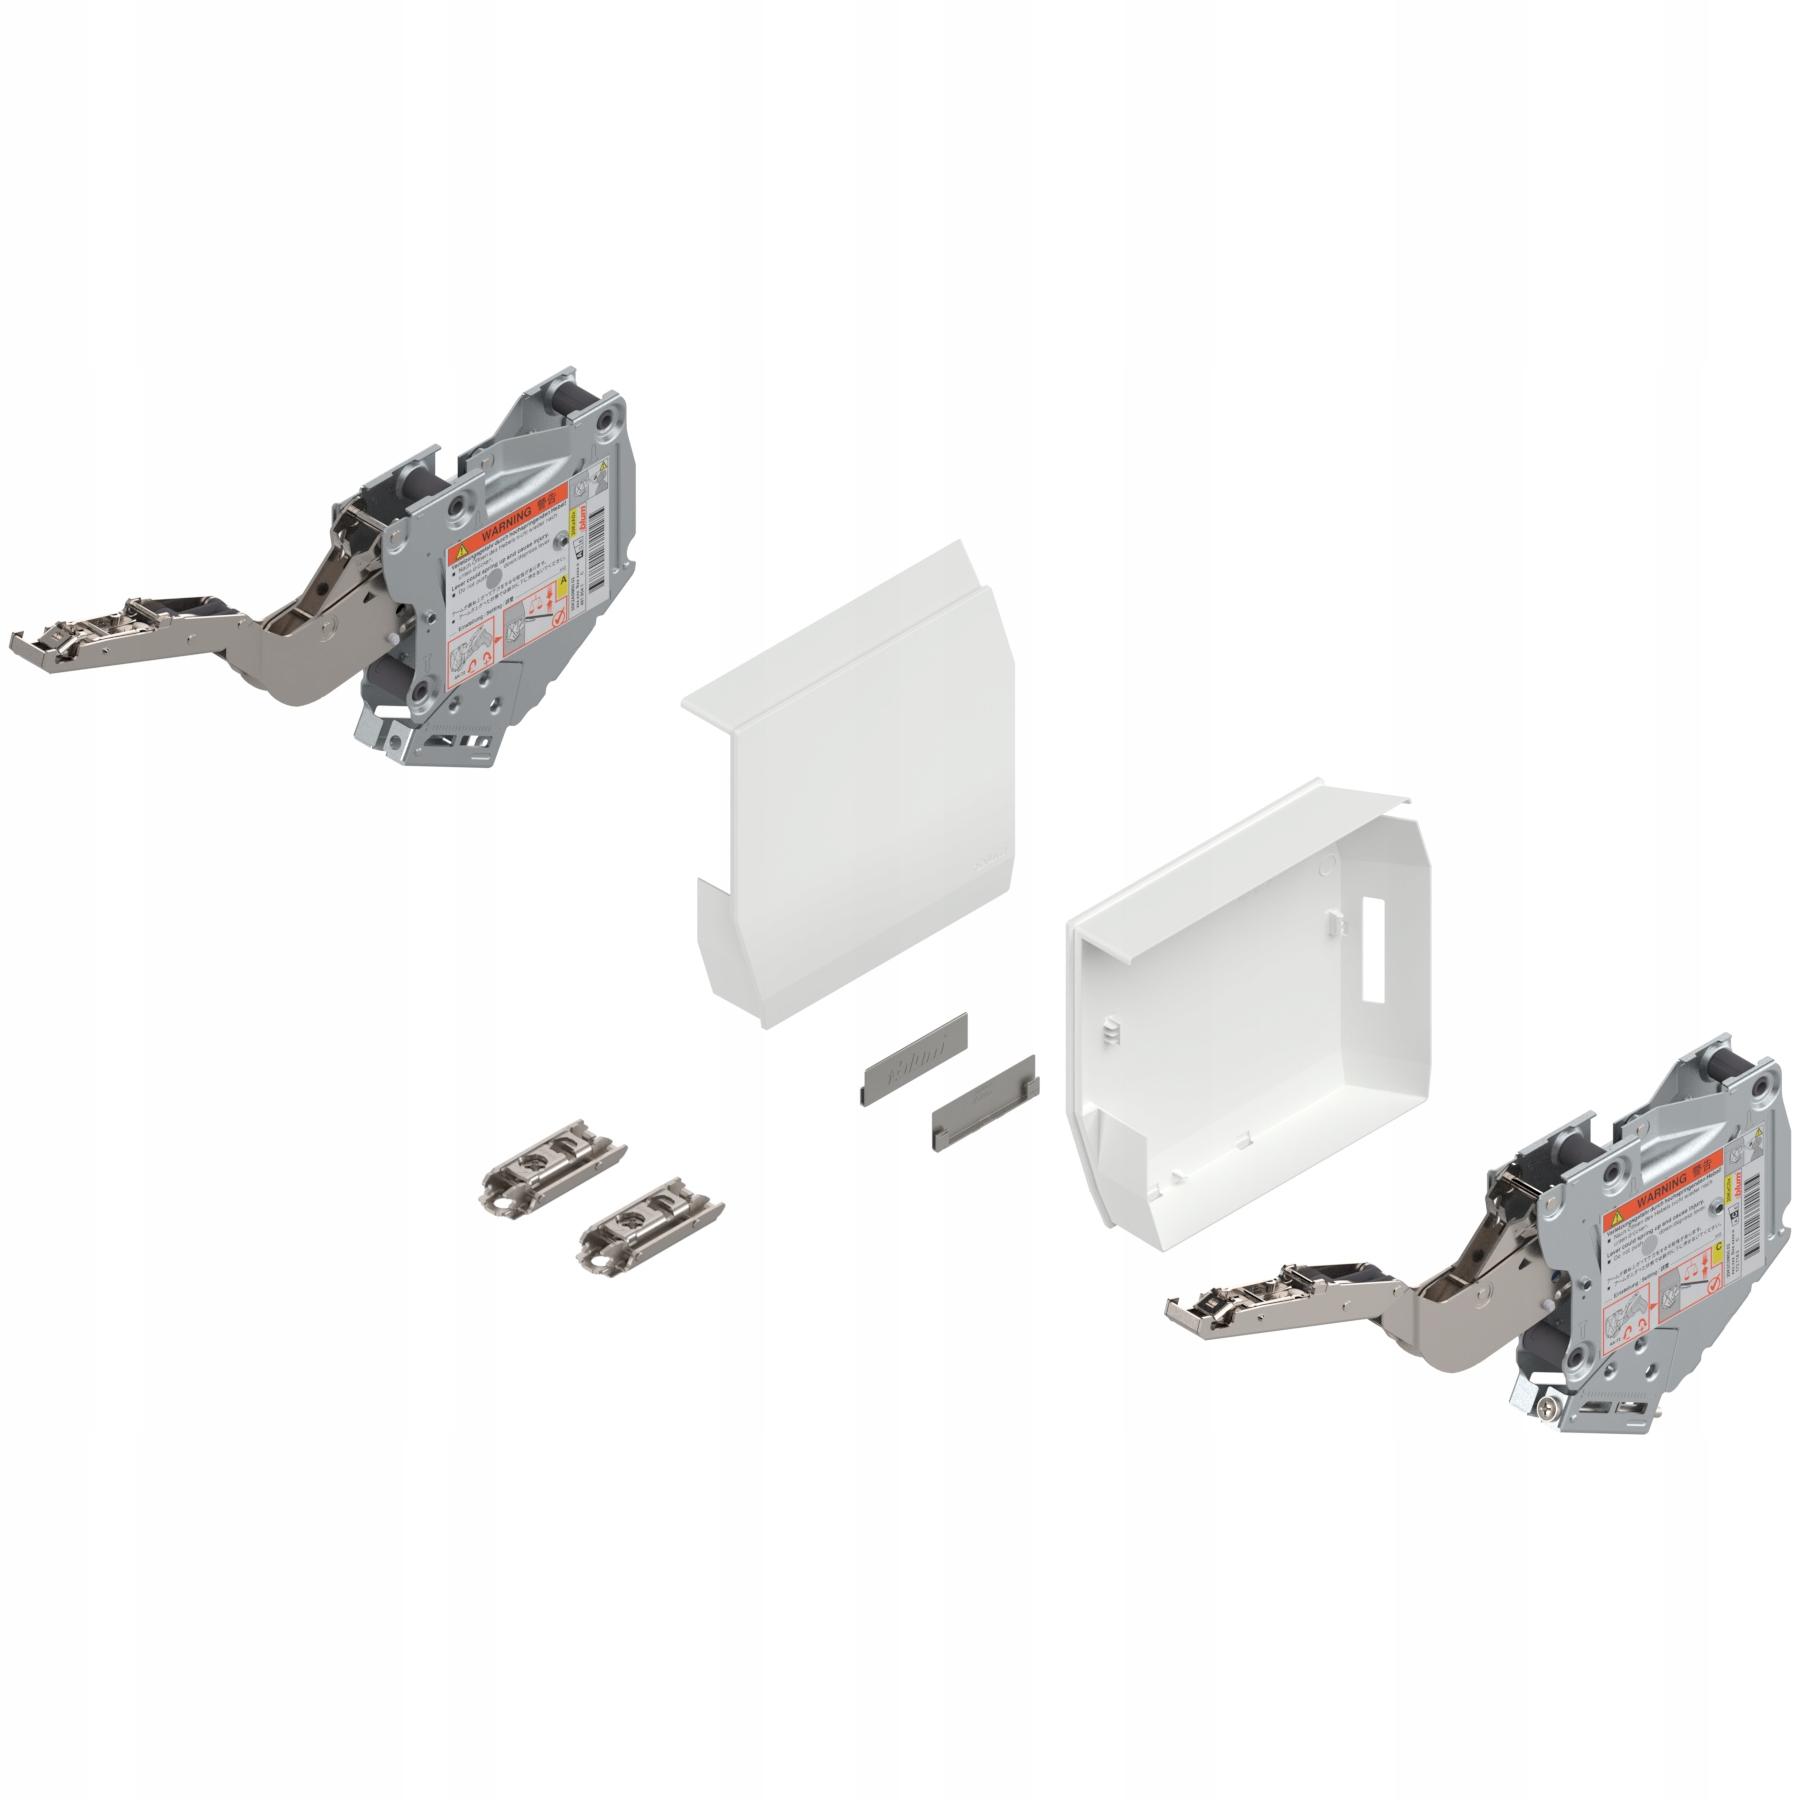 Biely výťah Aventos HK-S Blum TIP-ON 20K2E01T